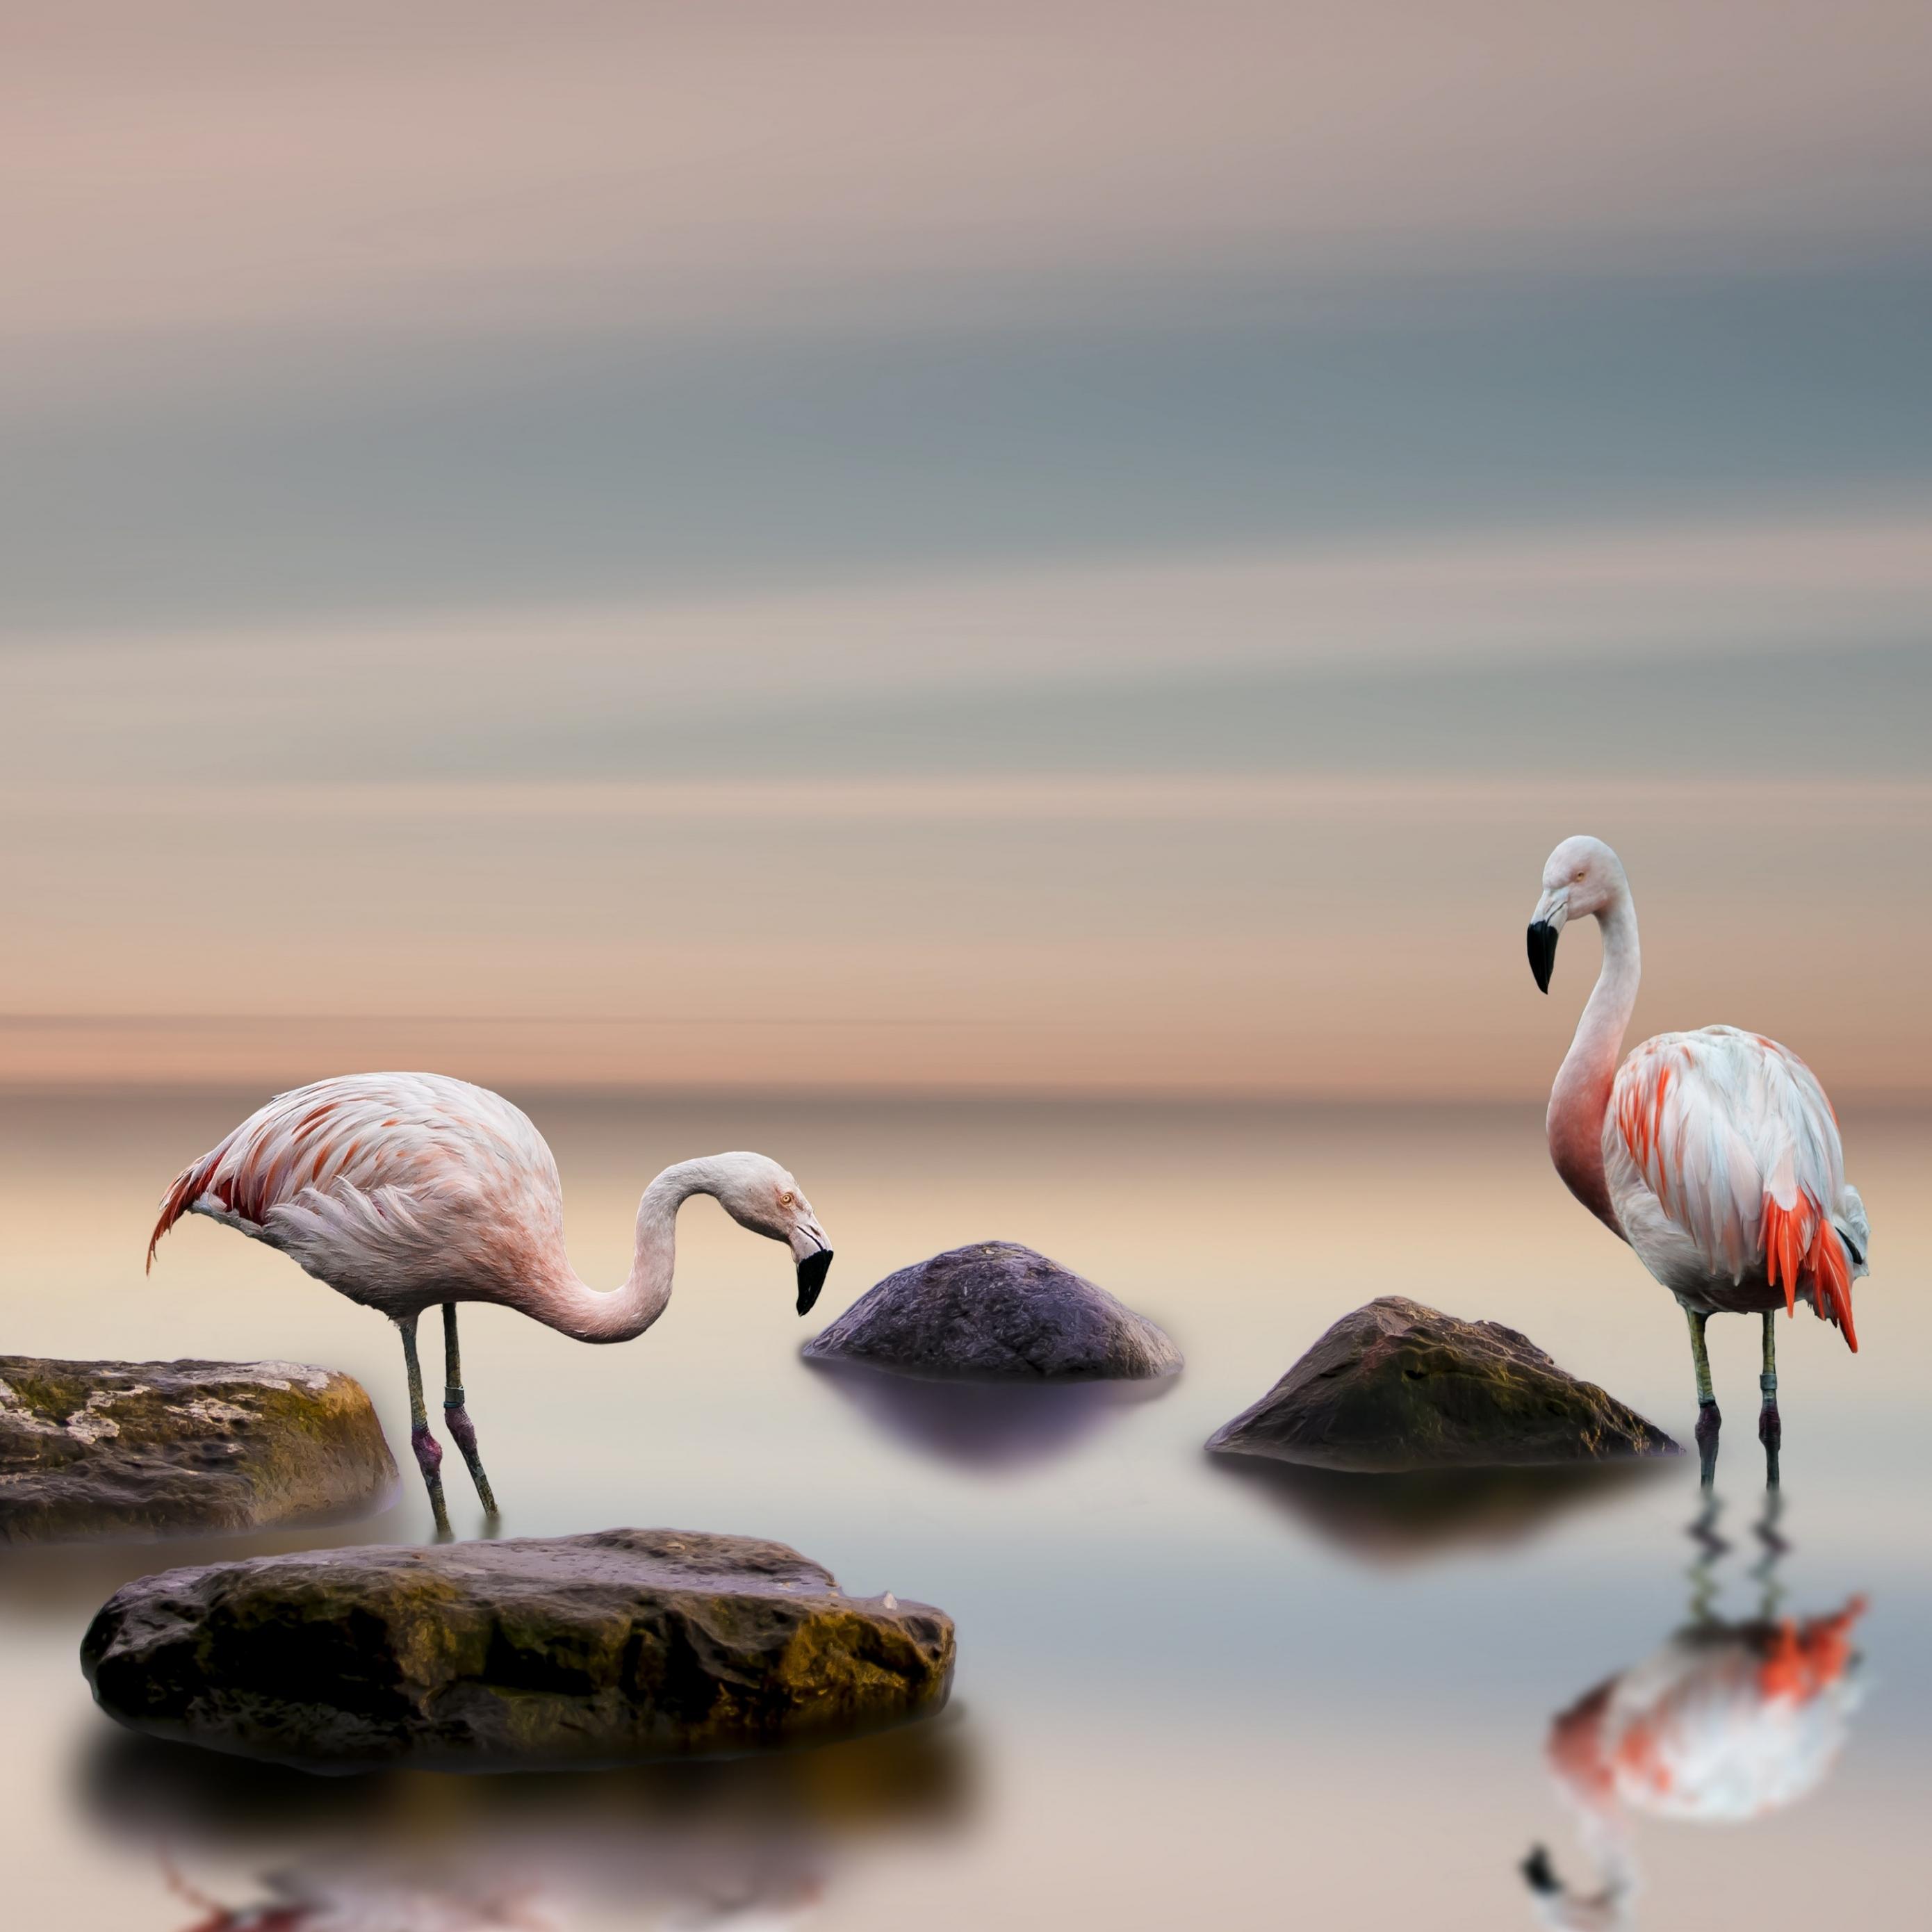 Download flamingo bird ocean 5k 27700 Apple iPad Air wallpaper 2780x2780